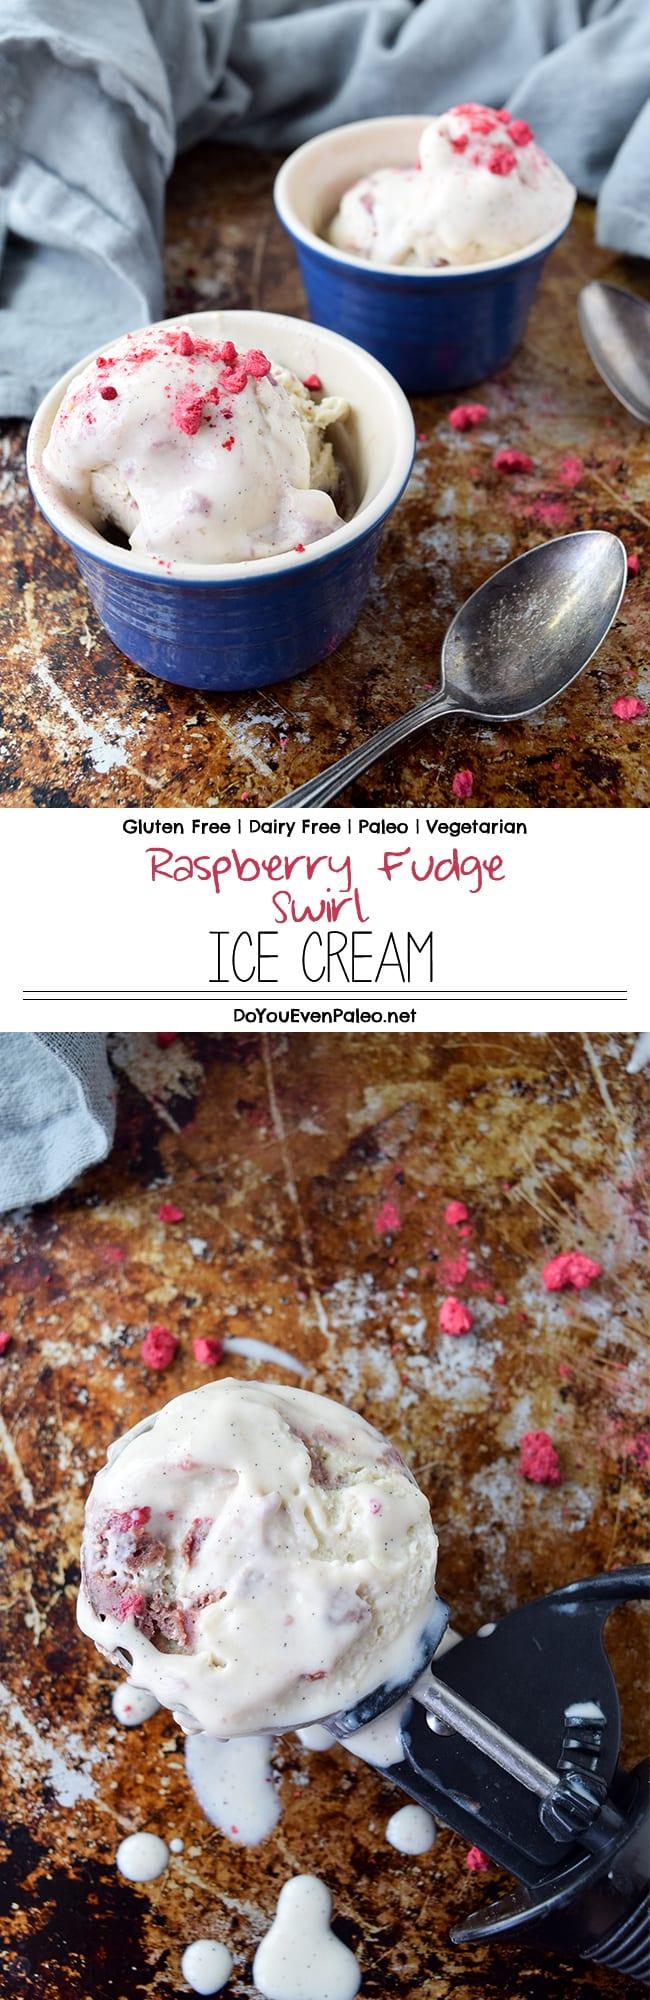 Raspberry Fudge Swirl Ice Cream - a dairy free, gluten free, paleo and vegetarian ice cream using freeze-dried raspberries for the best pop of summer flavor! | DoYouEvenPaleo.net